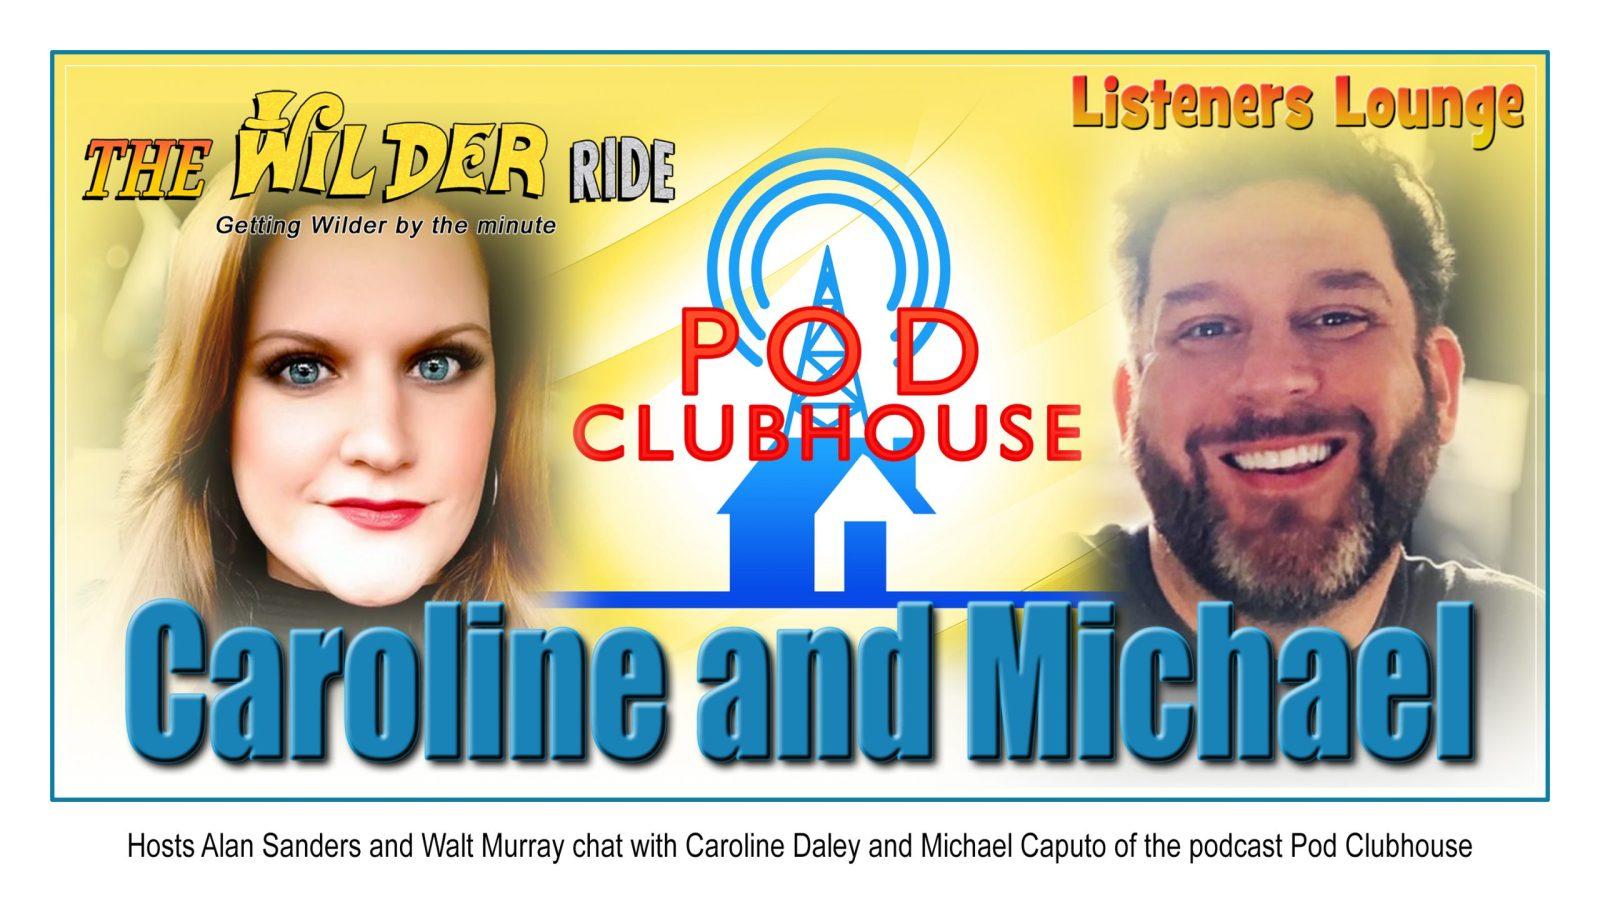 Caroline Daley and Michael Caputo of Pod Clubhouse